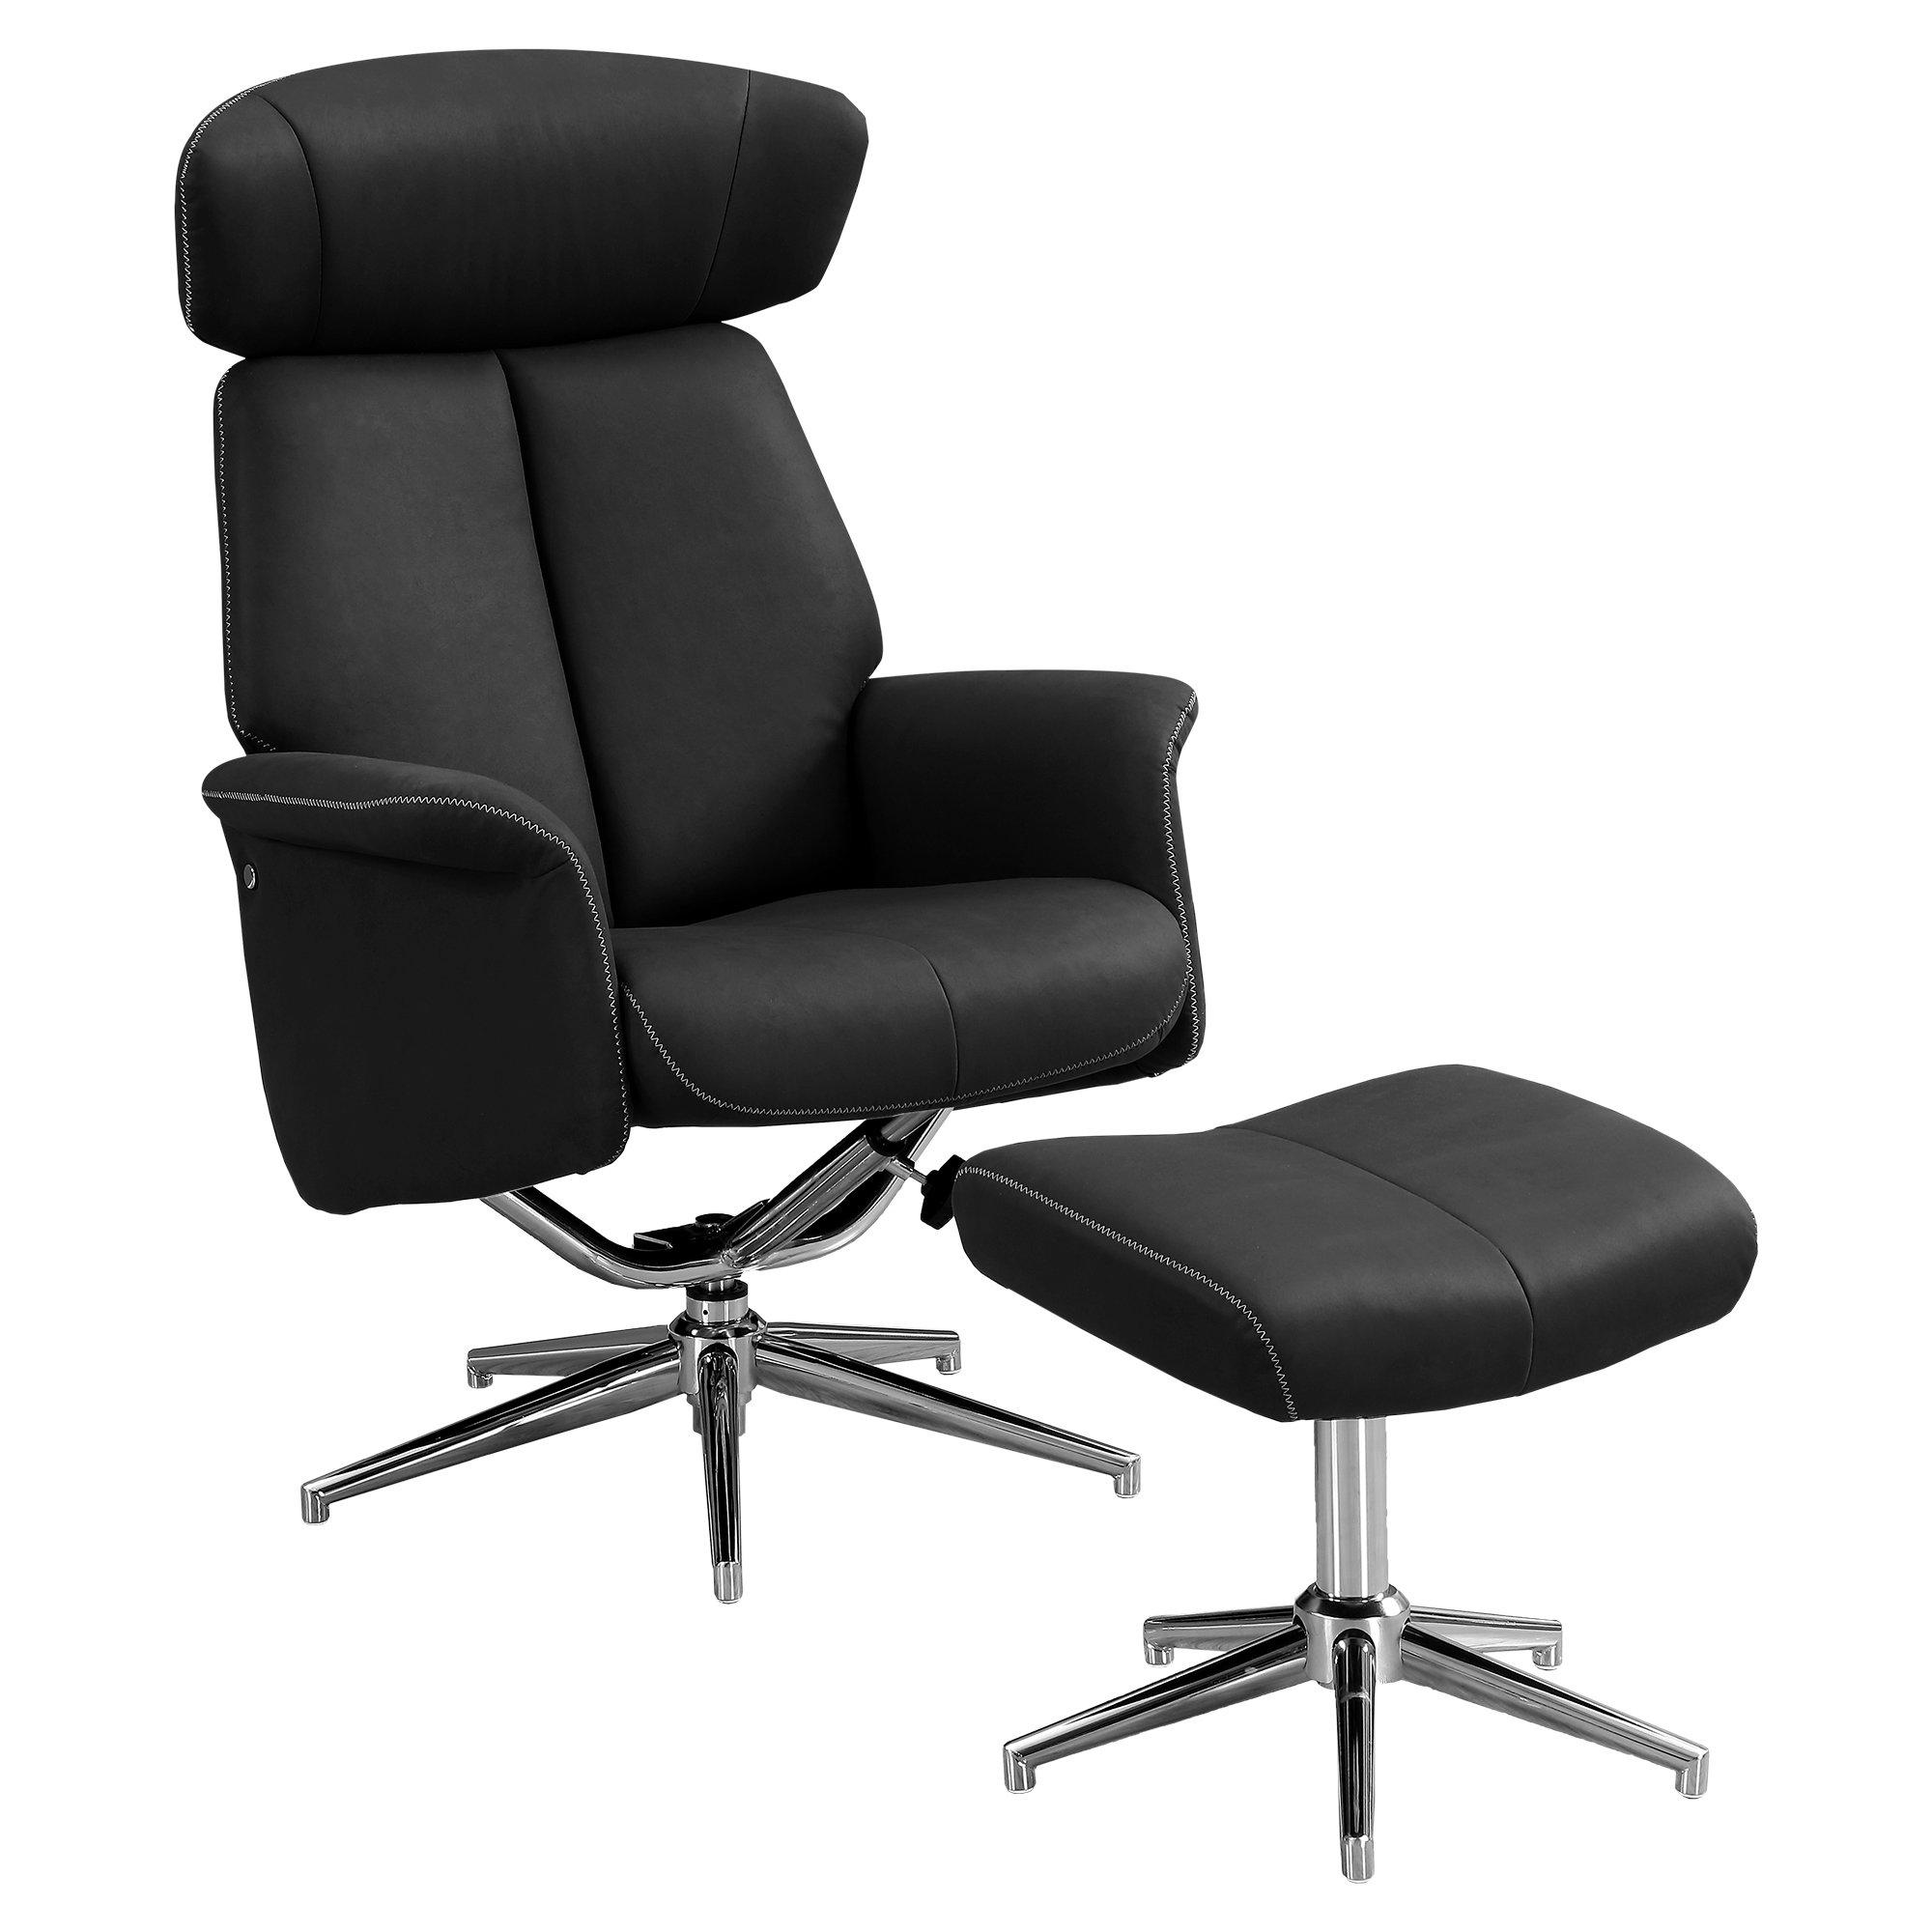 "44"" x 47"" x 59"" Black Finish Foam and Metal Swivel Reclining Chair with Adjustable Headrest"